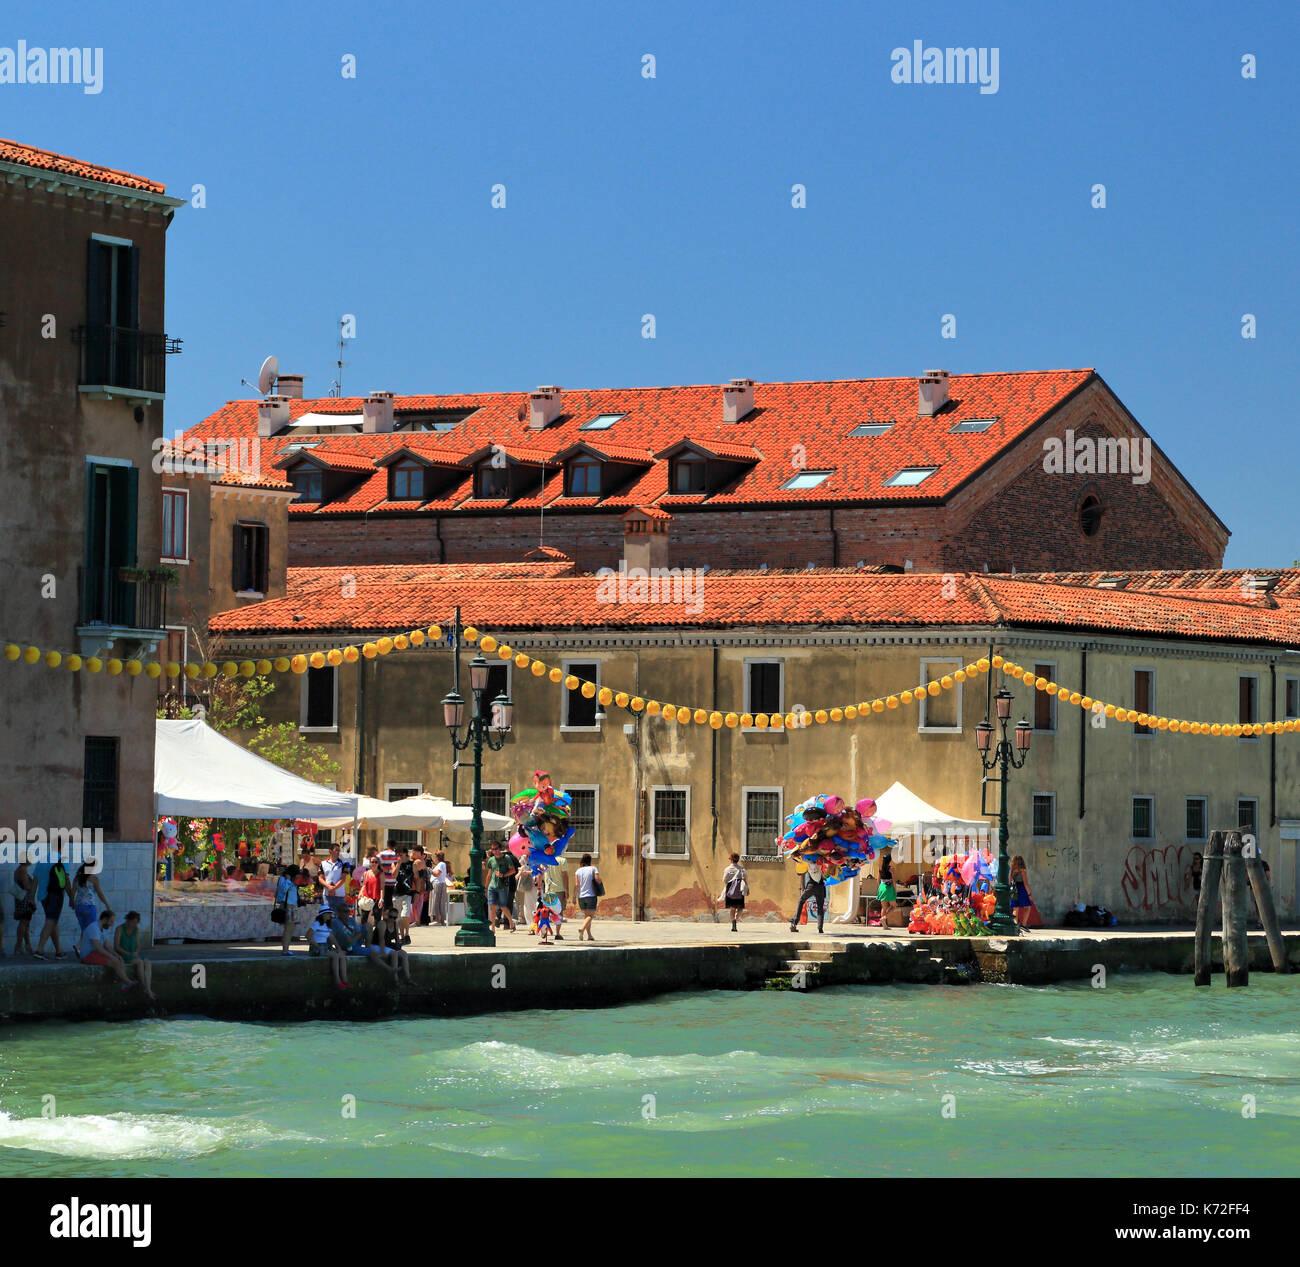 Giudecca, Festa del Redentore Venedig, dem Fest des Heiligsten Erlösers Venezia Stockbild